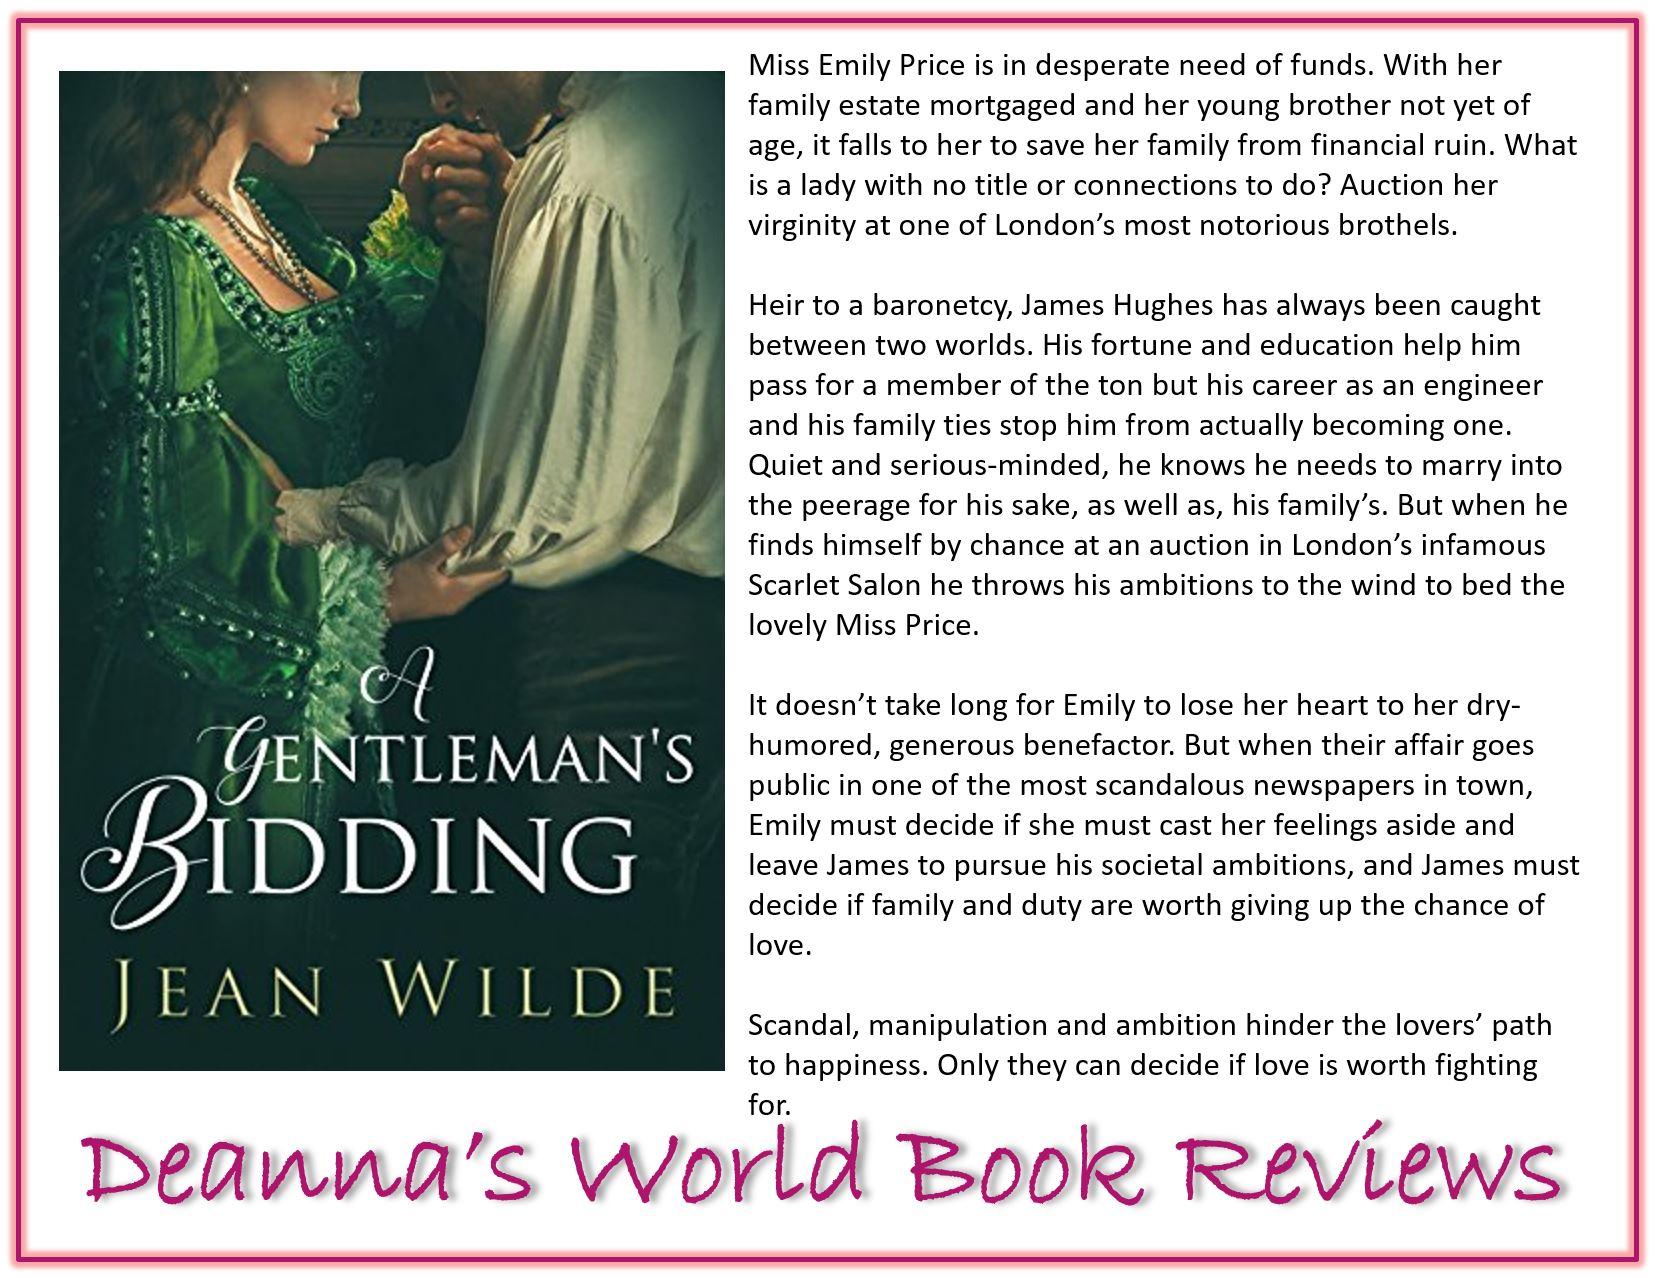 A Gentleman's Bidding by Jean Wilde